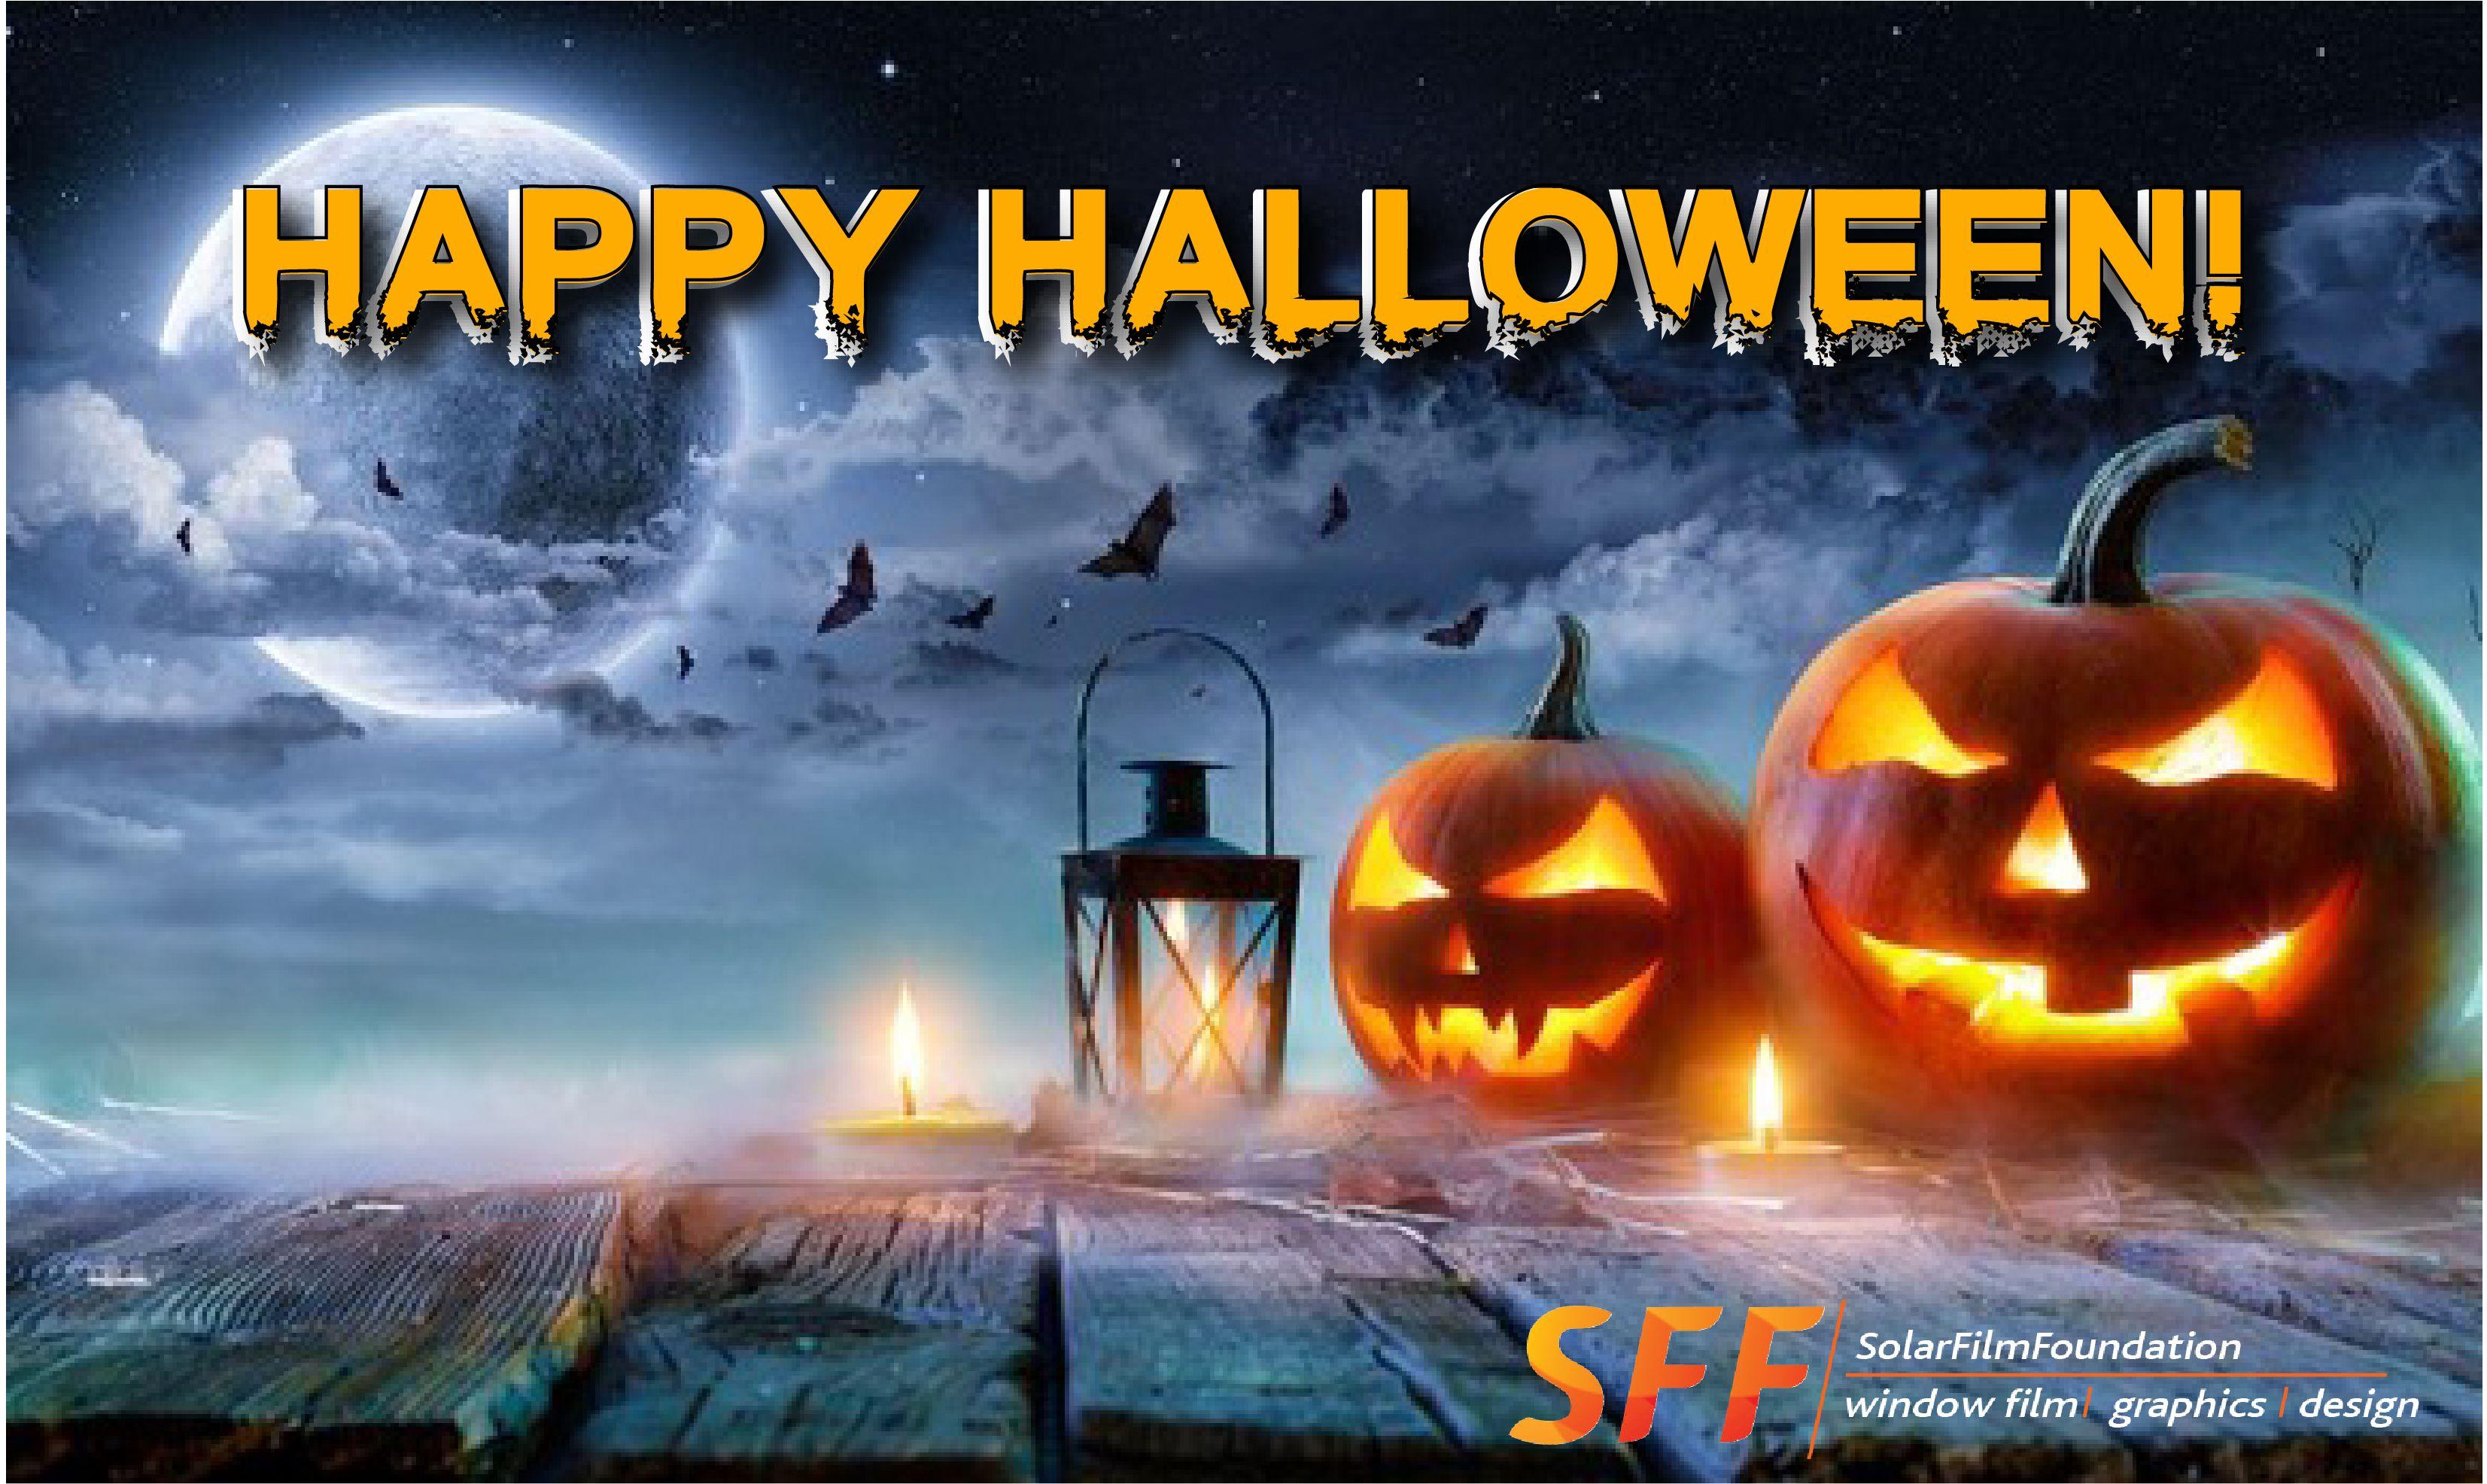 Happy Halloween! Halloween scene, Jack o lantern, Scene